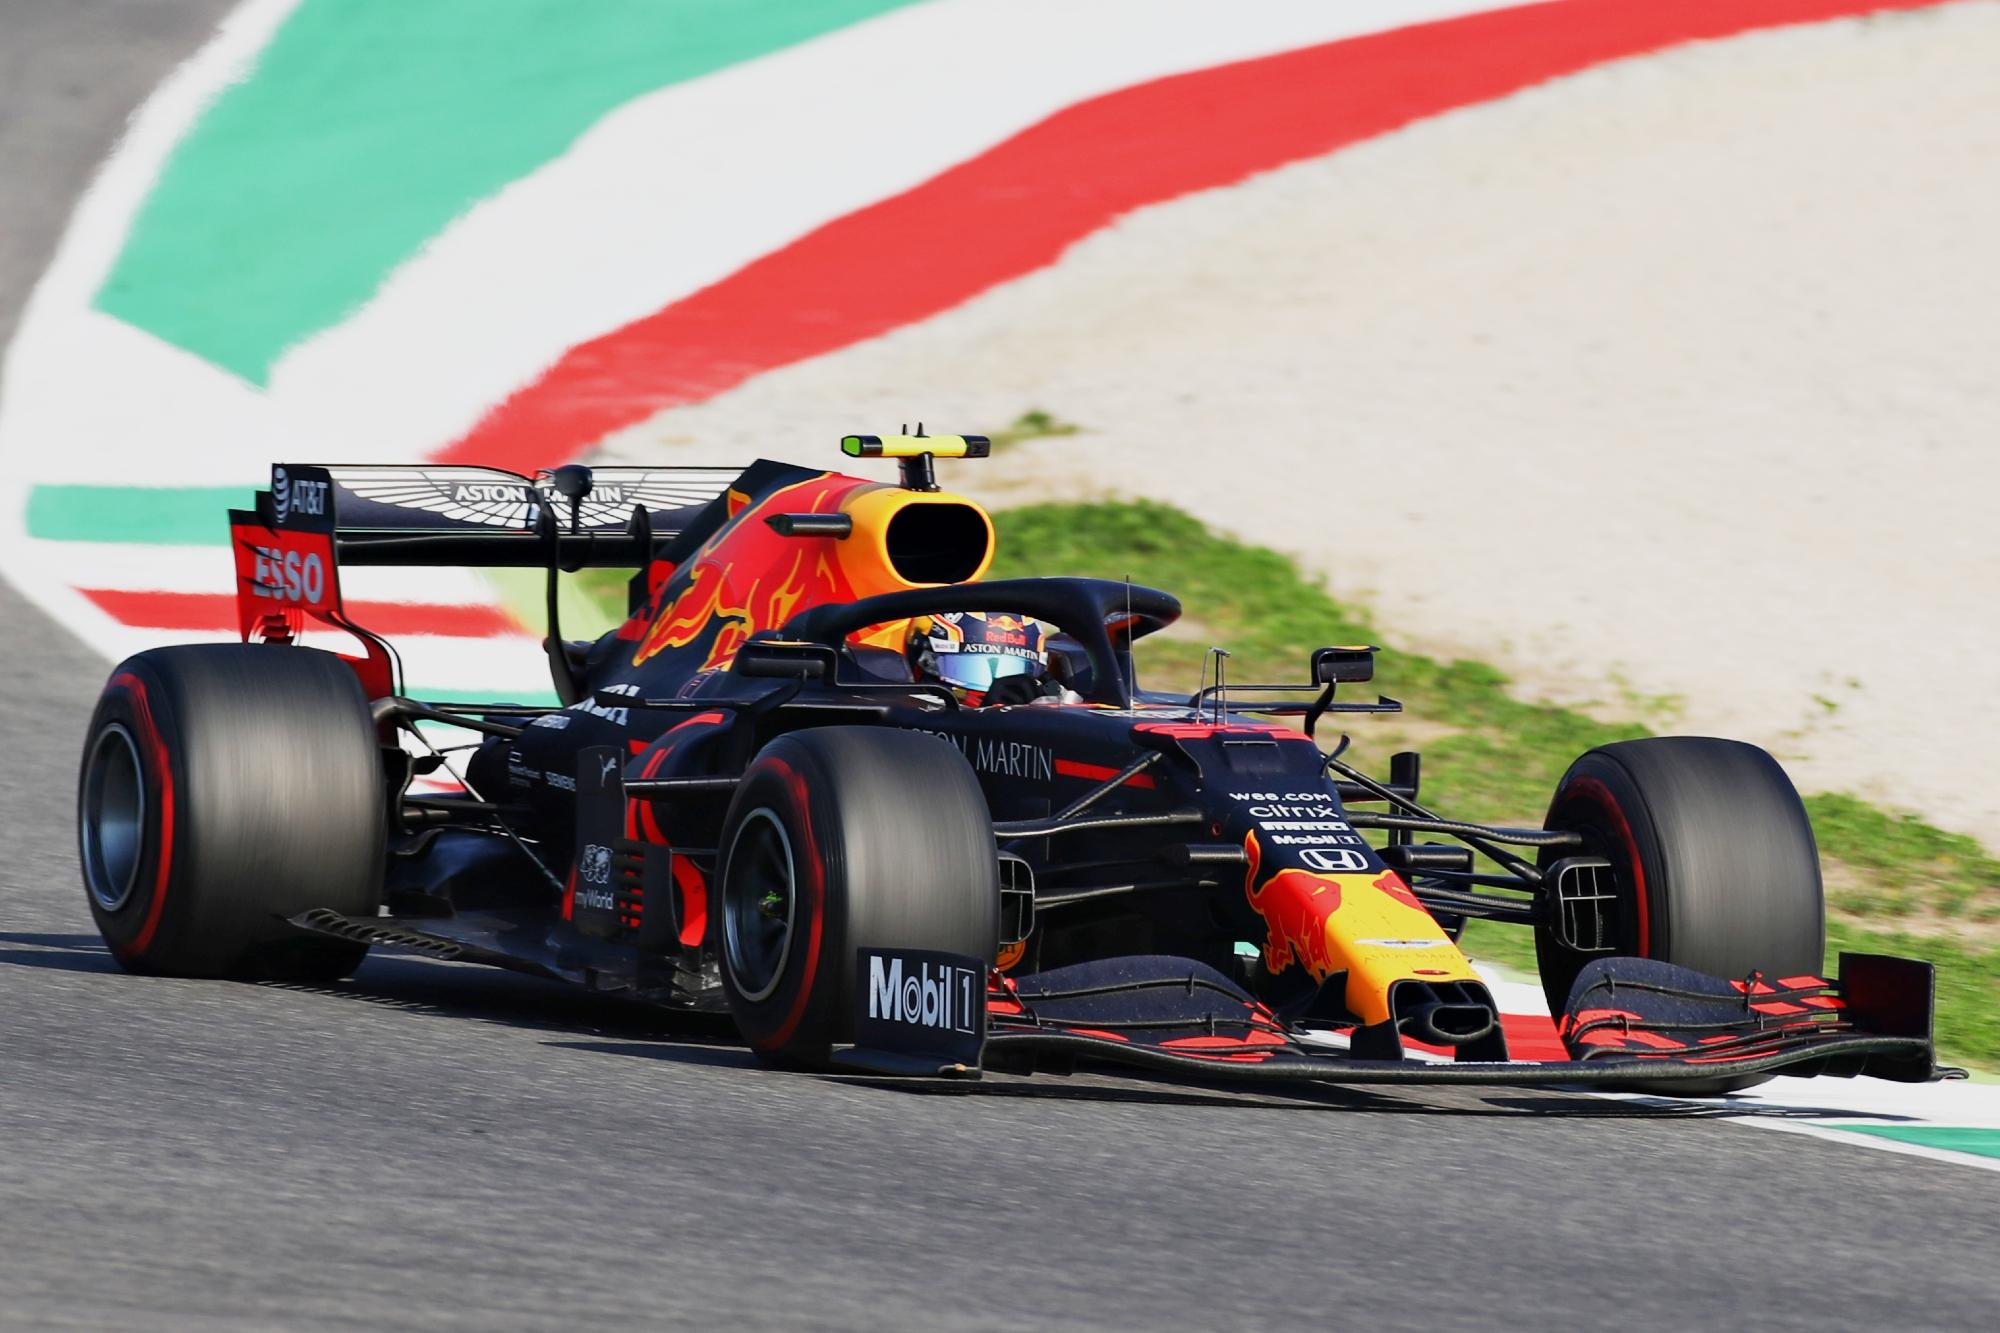 Red Bull, Alexander Albon, F1, Fórmula 1, 2020, 2021